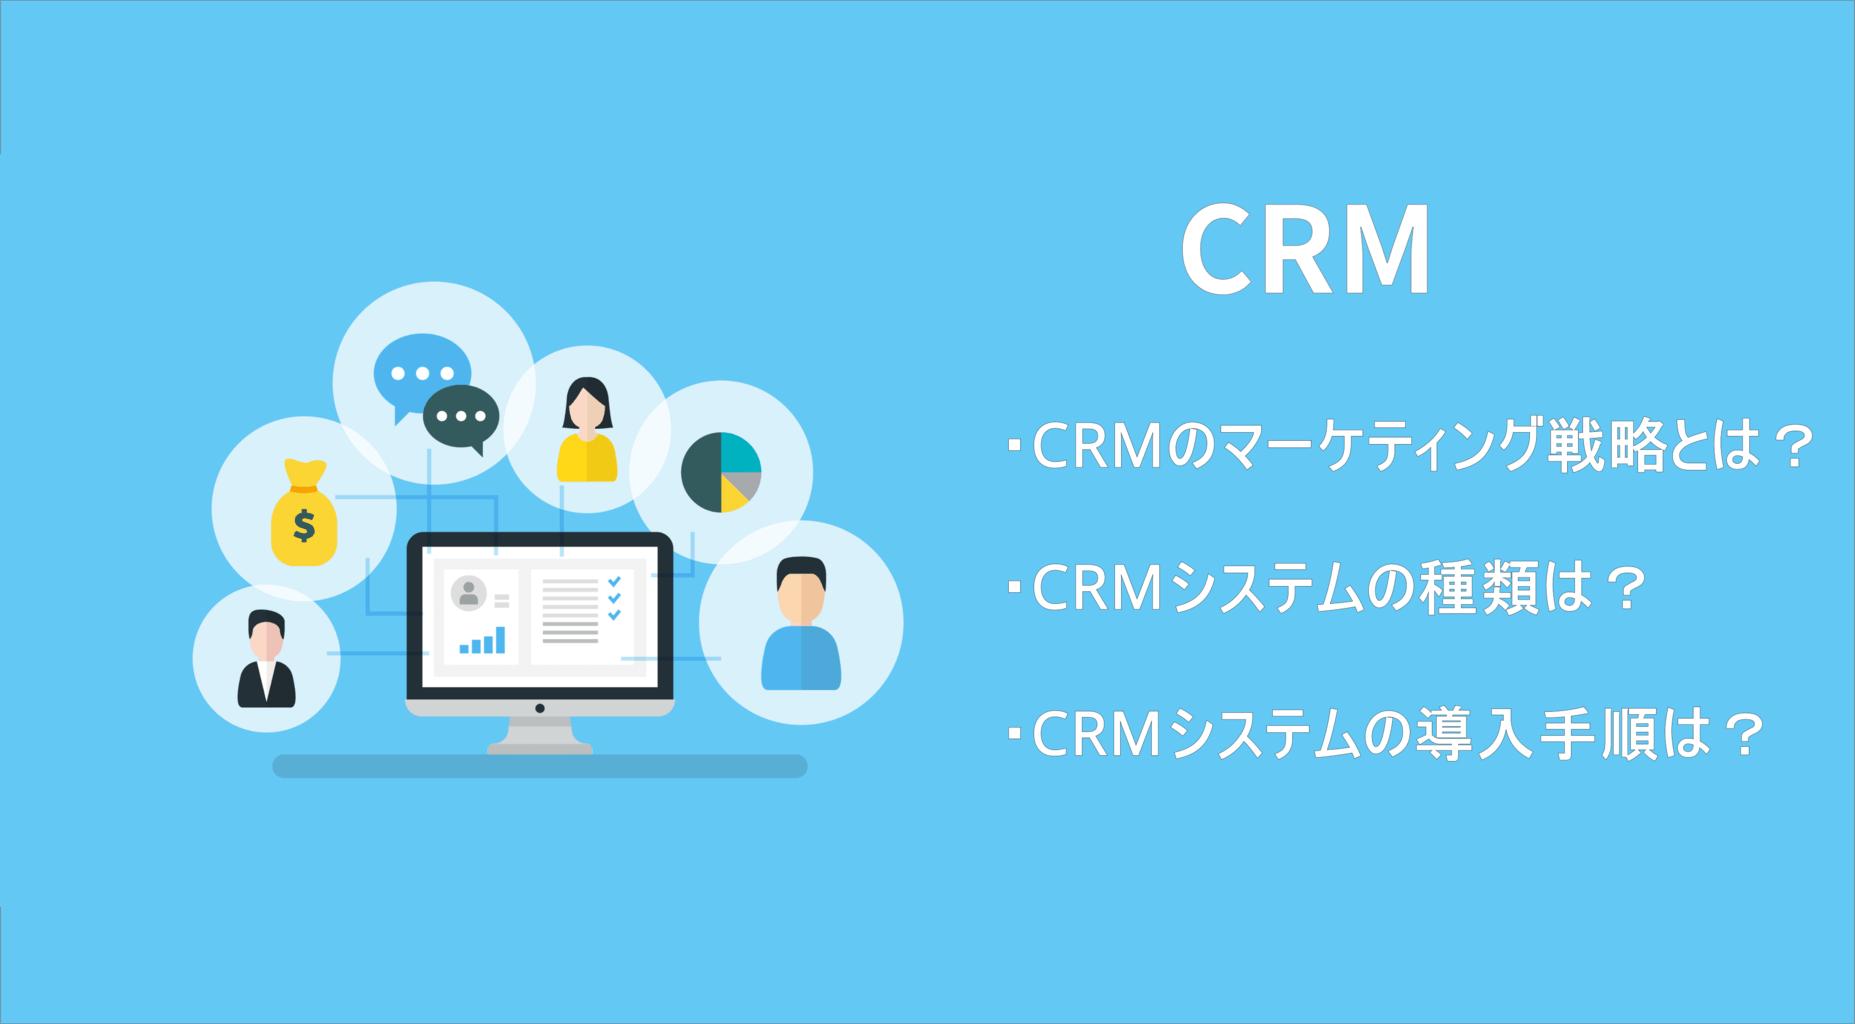 CRMシステムの導入手順とは?CRMシステムの種類やマーケティング戦略も紹介!